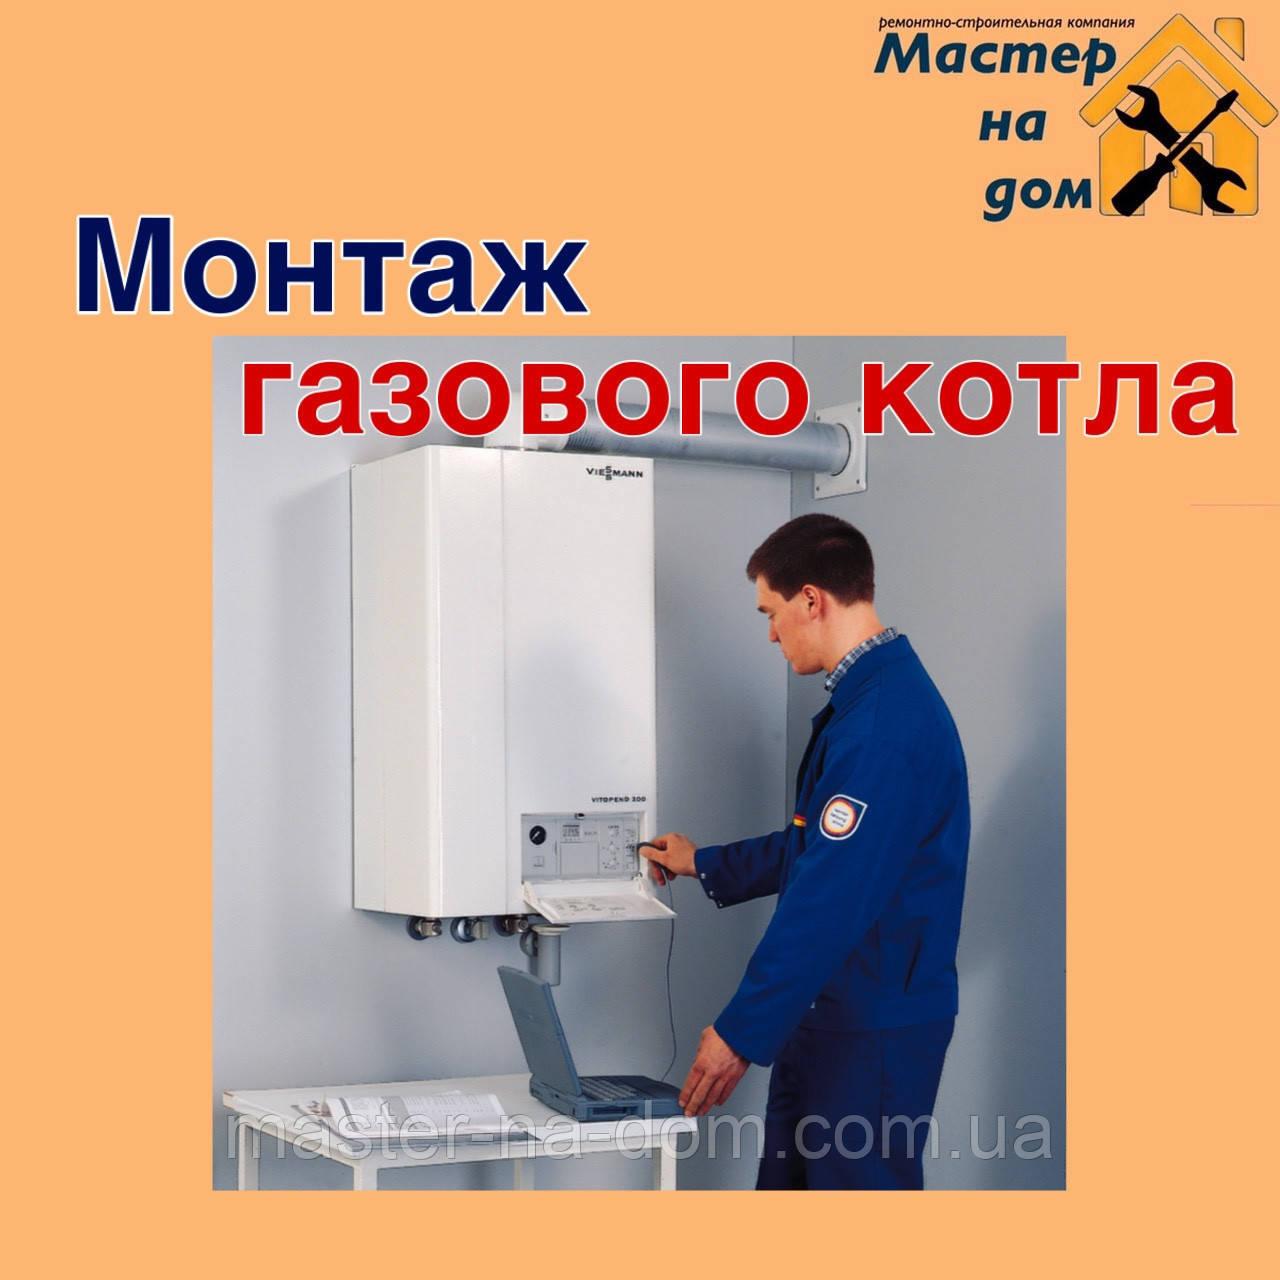 Монтаж газового котла, колонки в Луцке